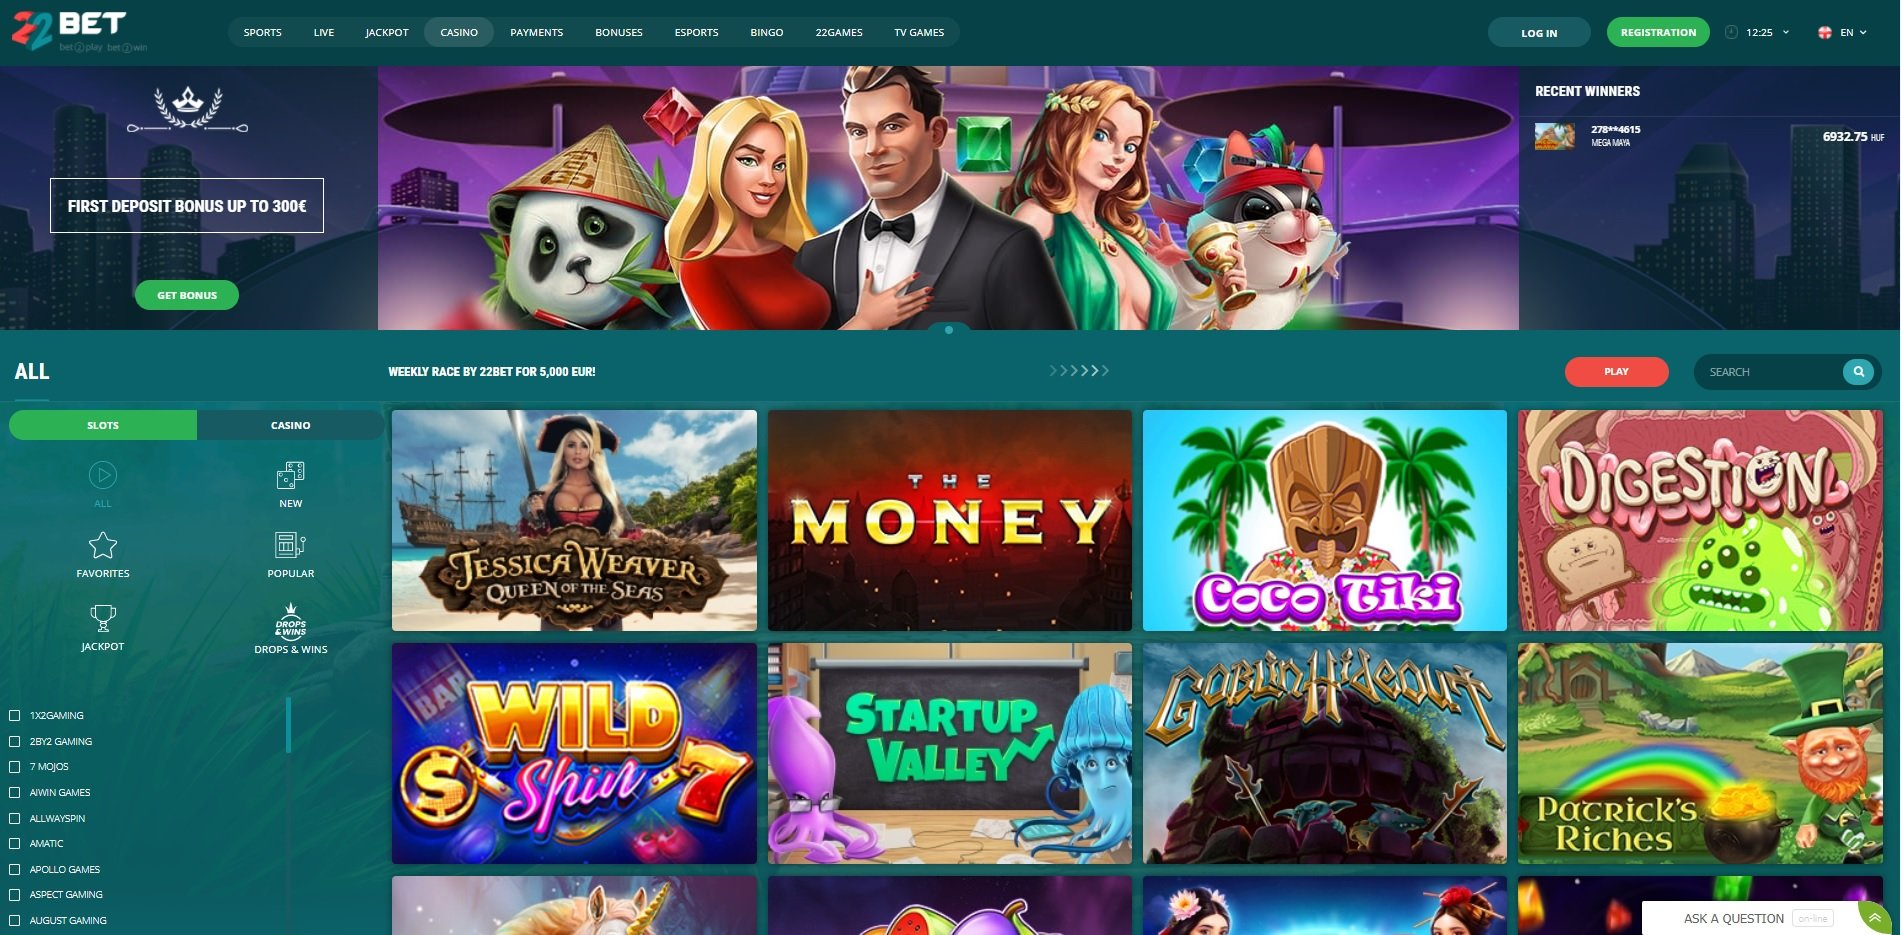 22Bet casino slot games lobby.